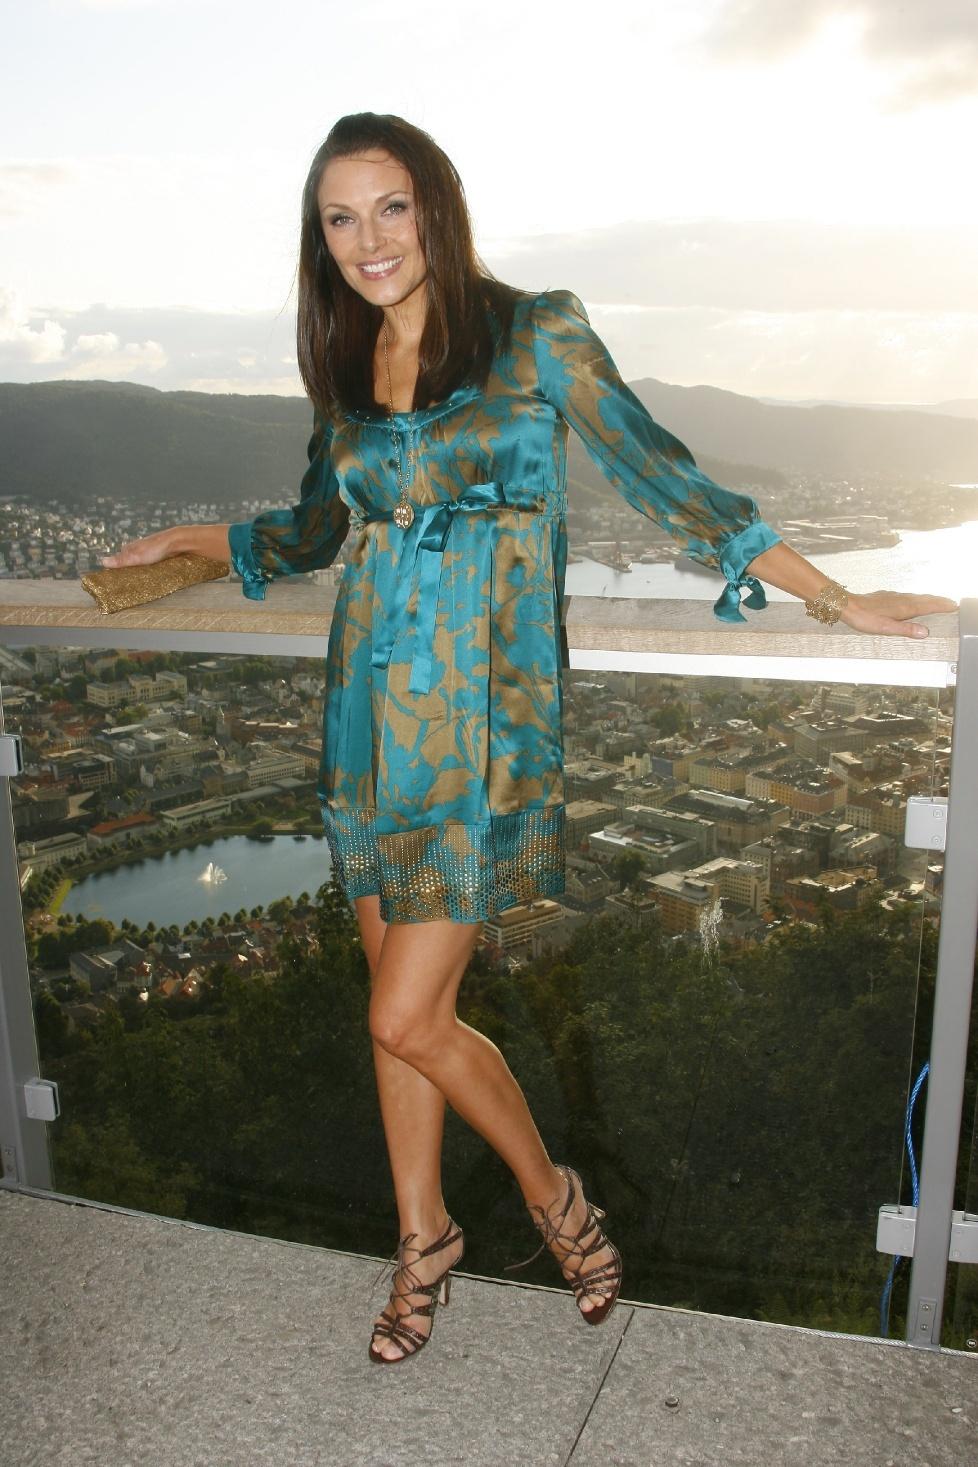 Mona Grudt's Feet Olivia Wilde Imdb